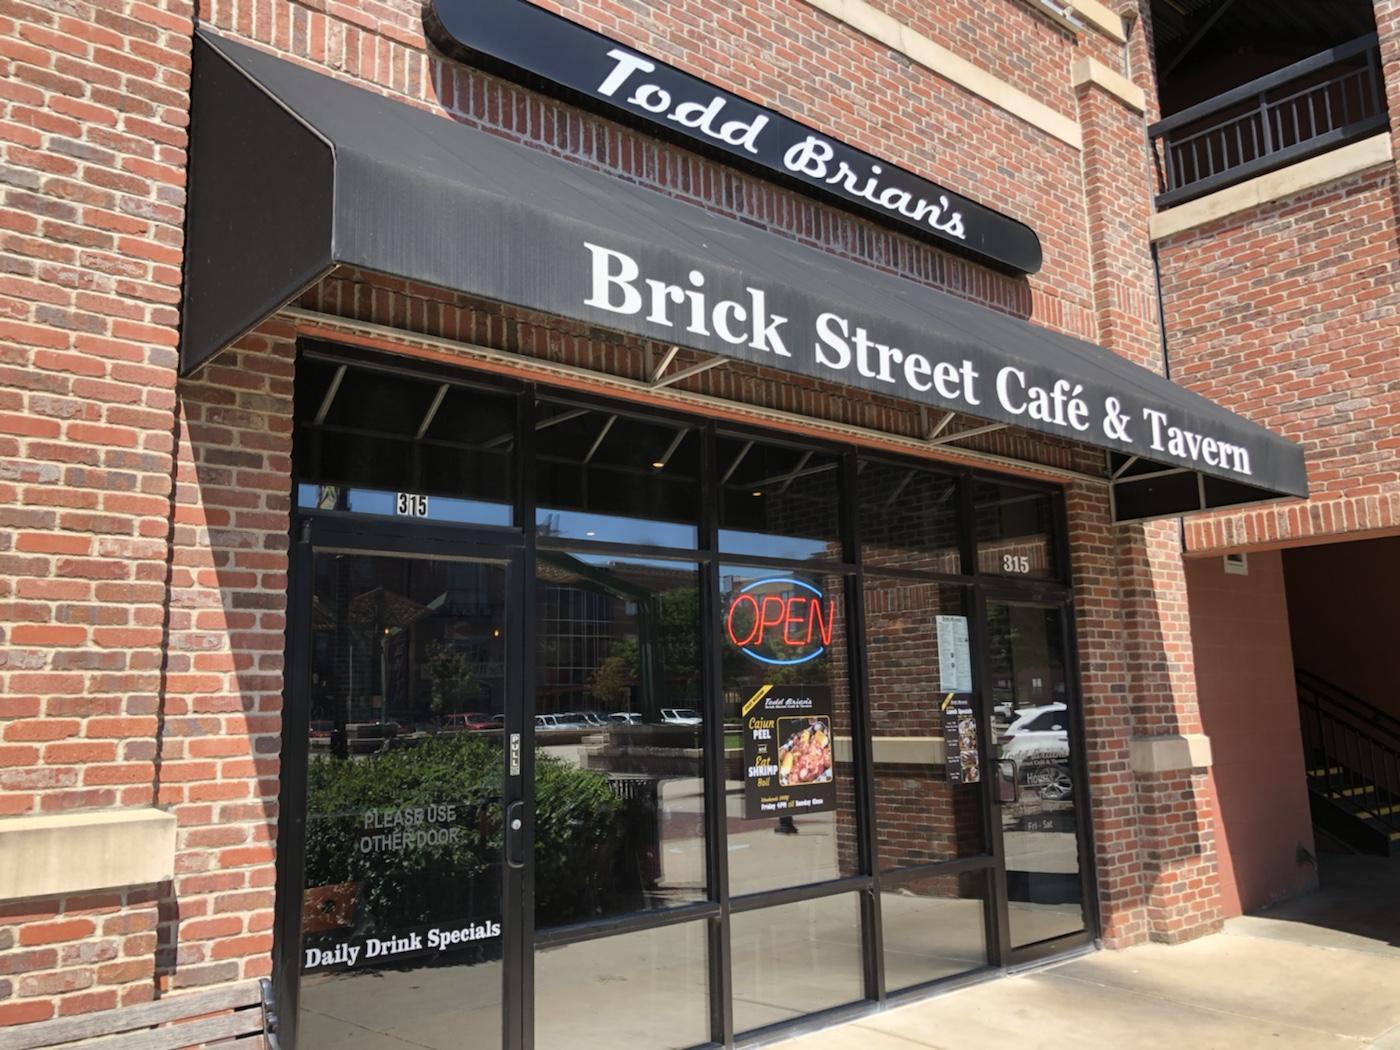 Todd Brian's Brick Street Cafe & Tavern